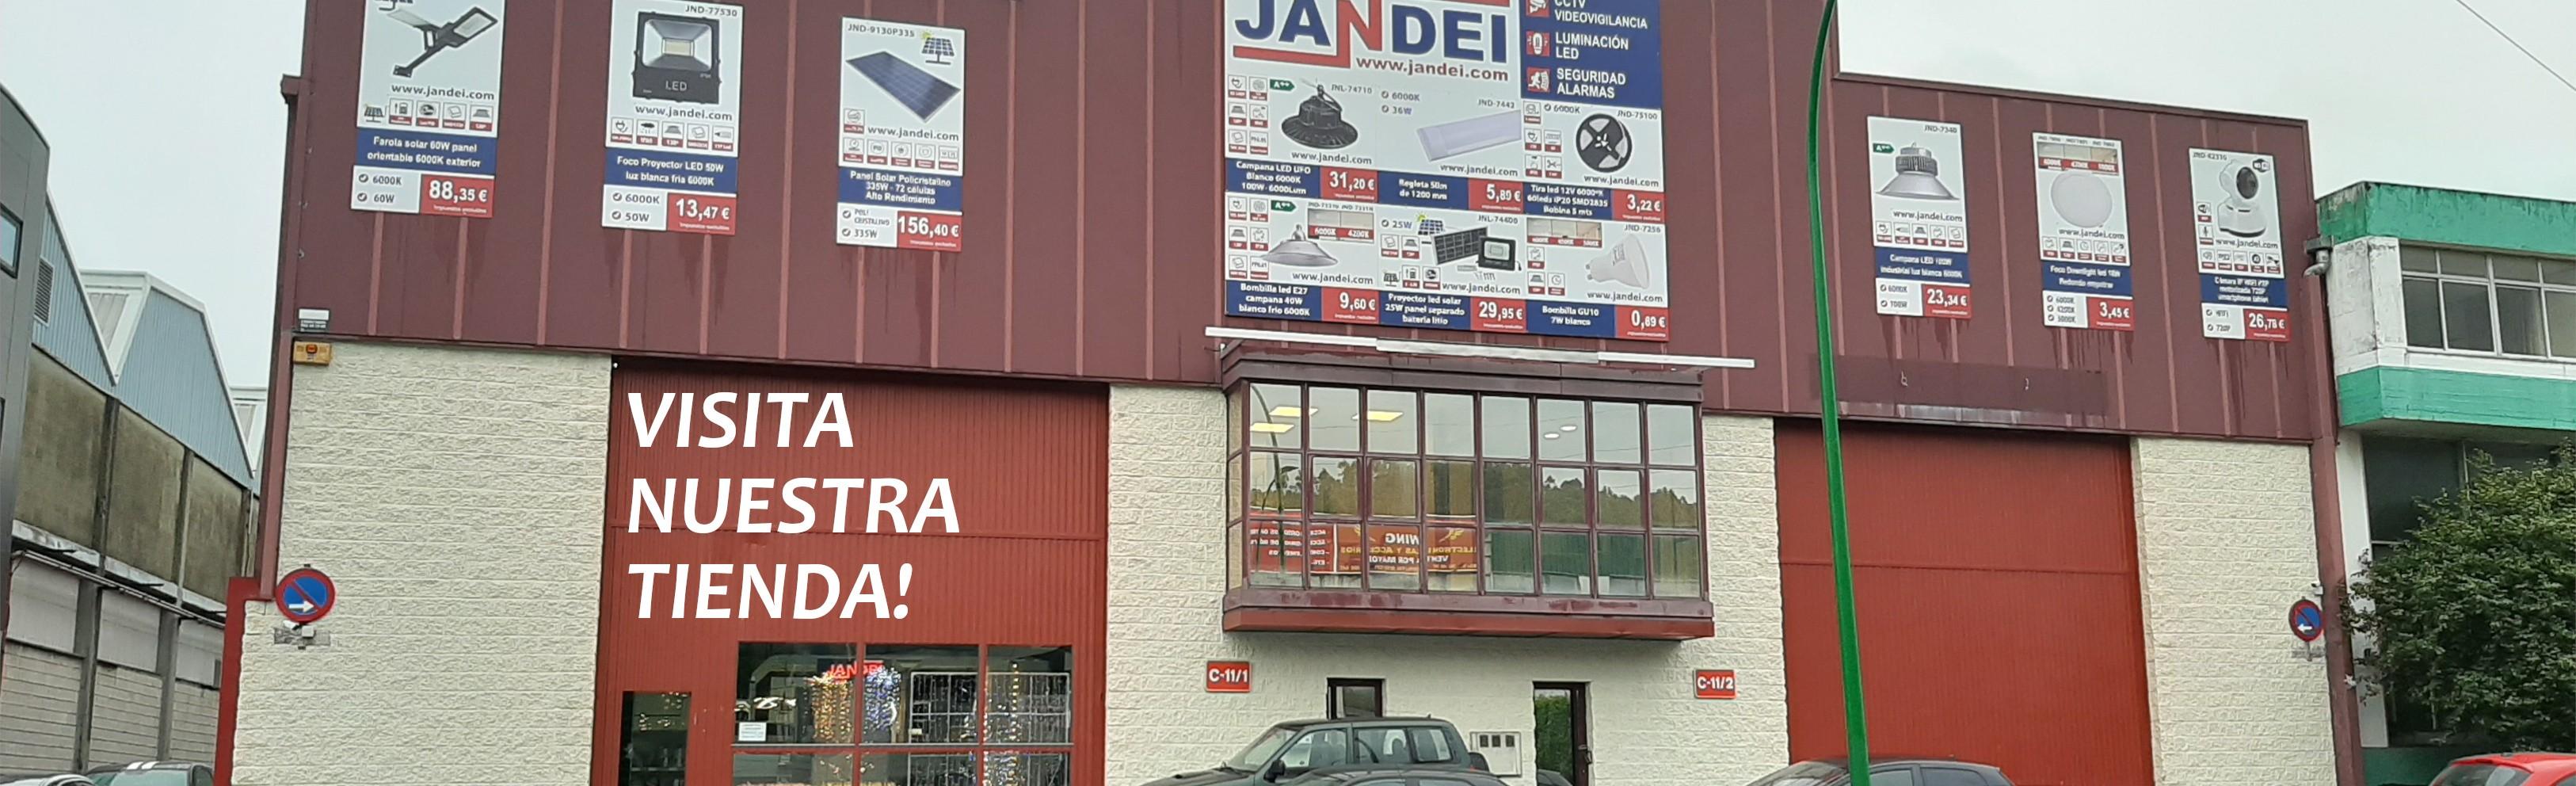 Tienda Jandei